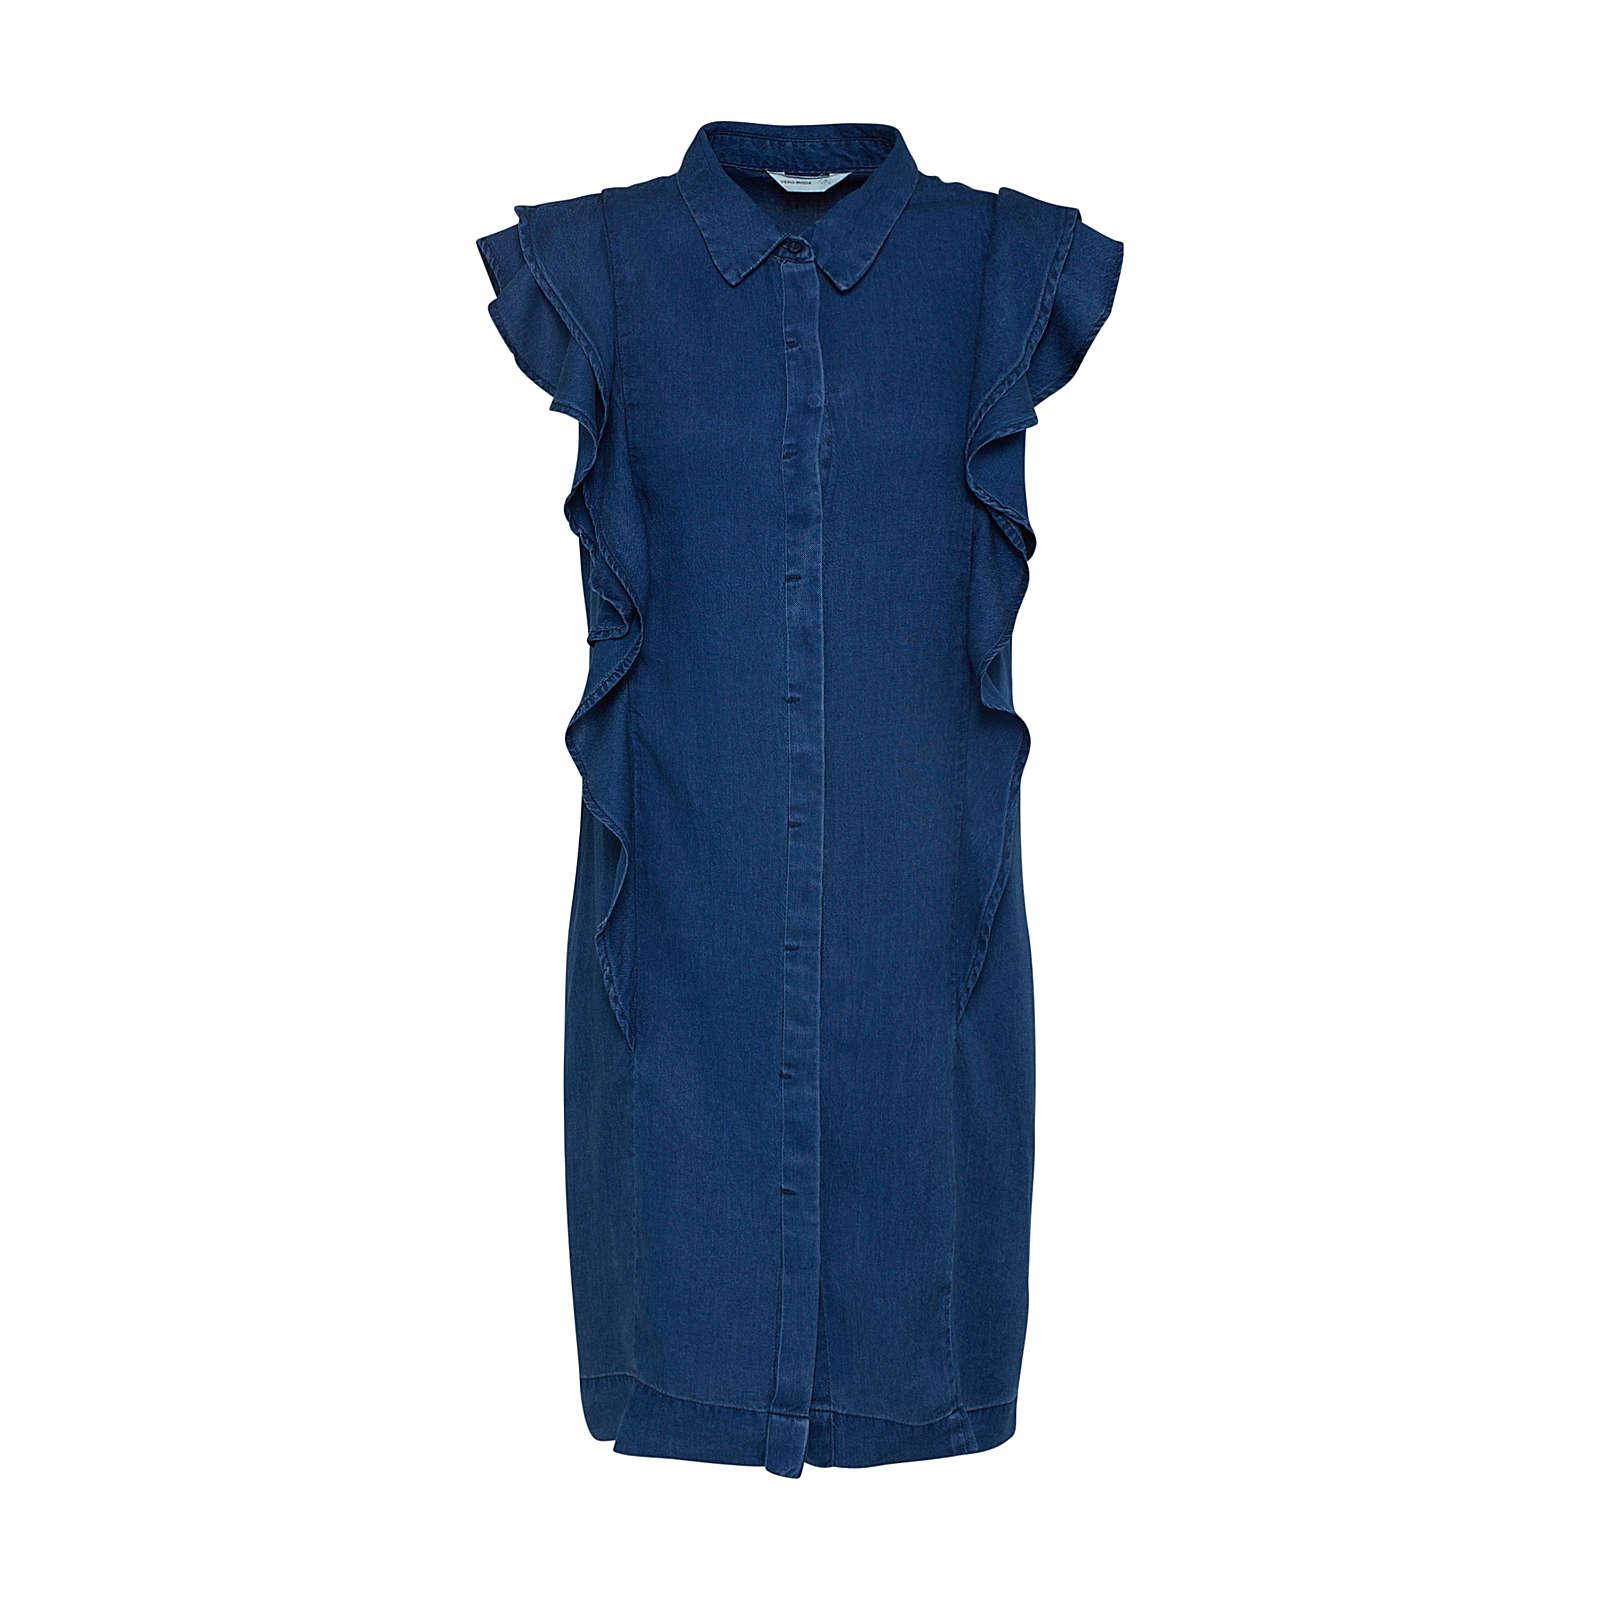 VERO MODA Kleid Jeanskleider blau Damen Gr. 36